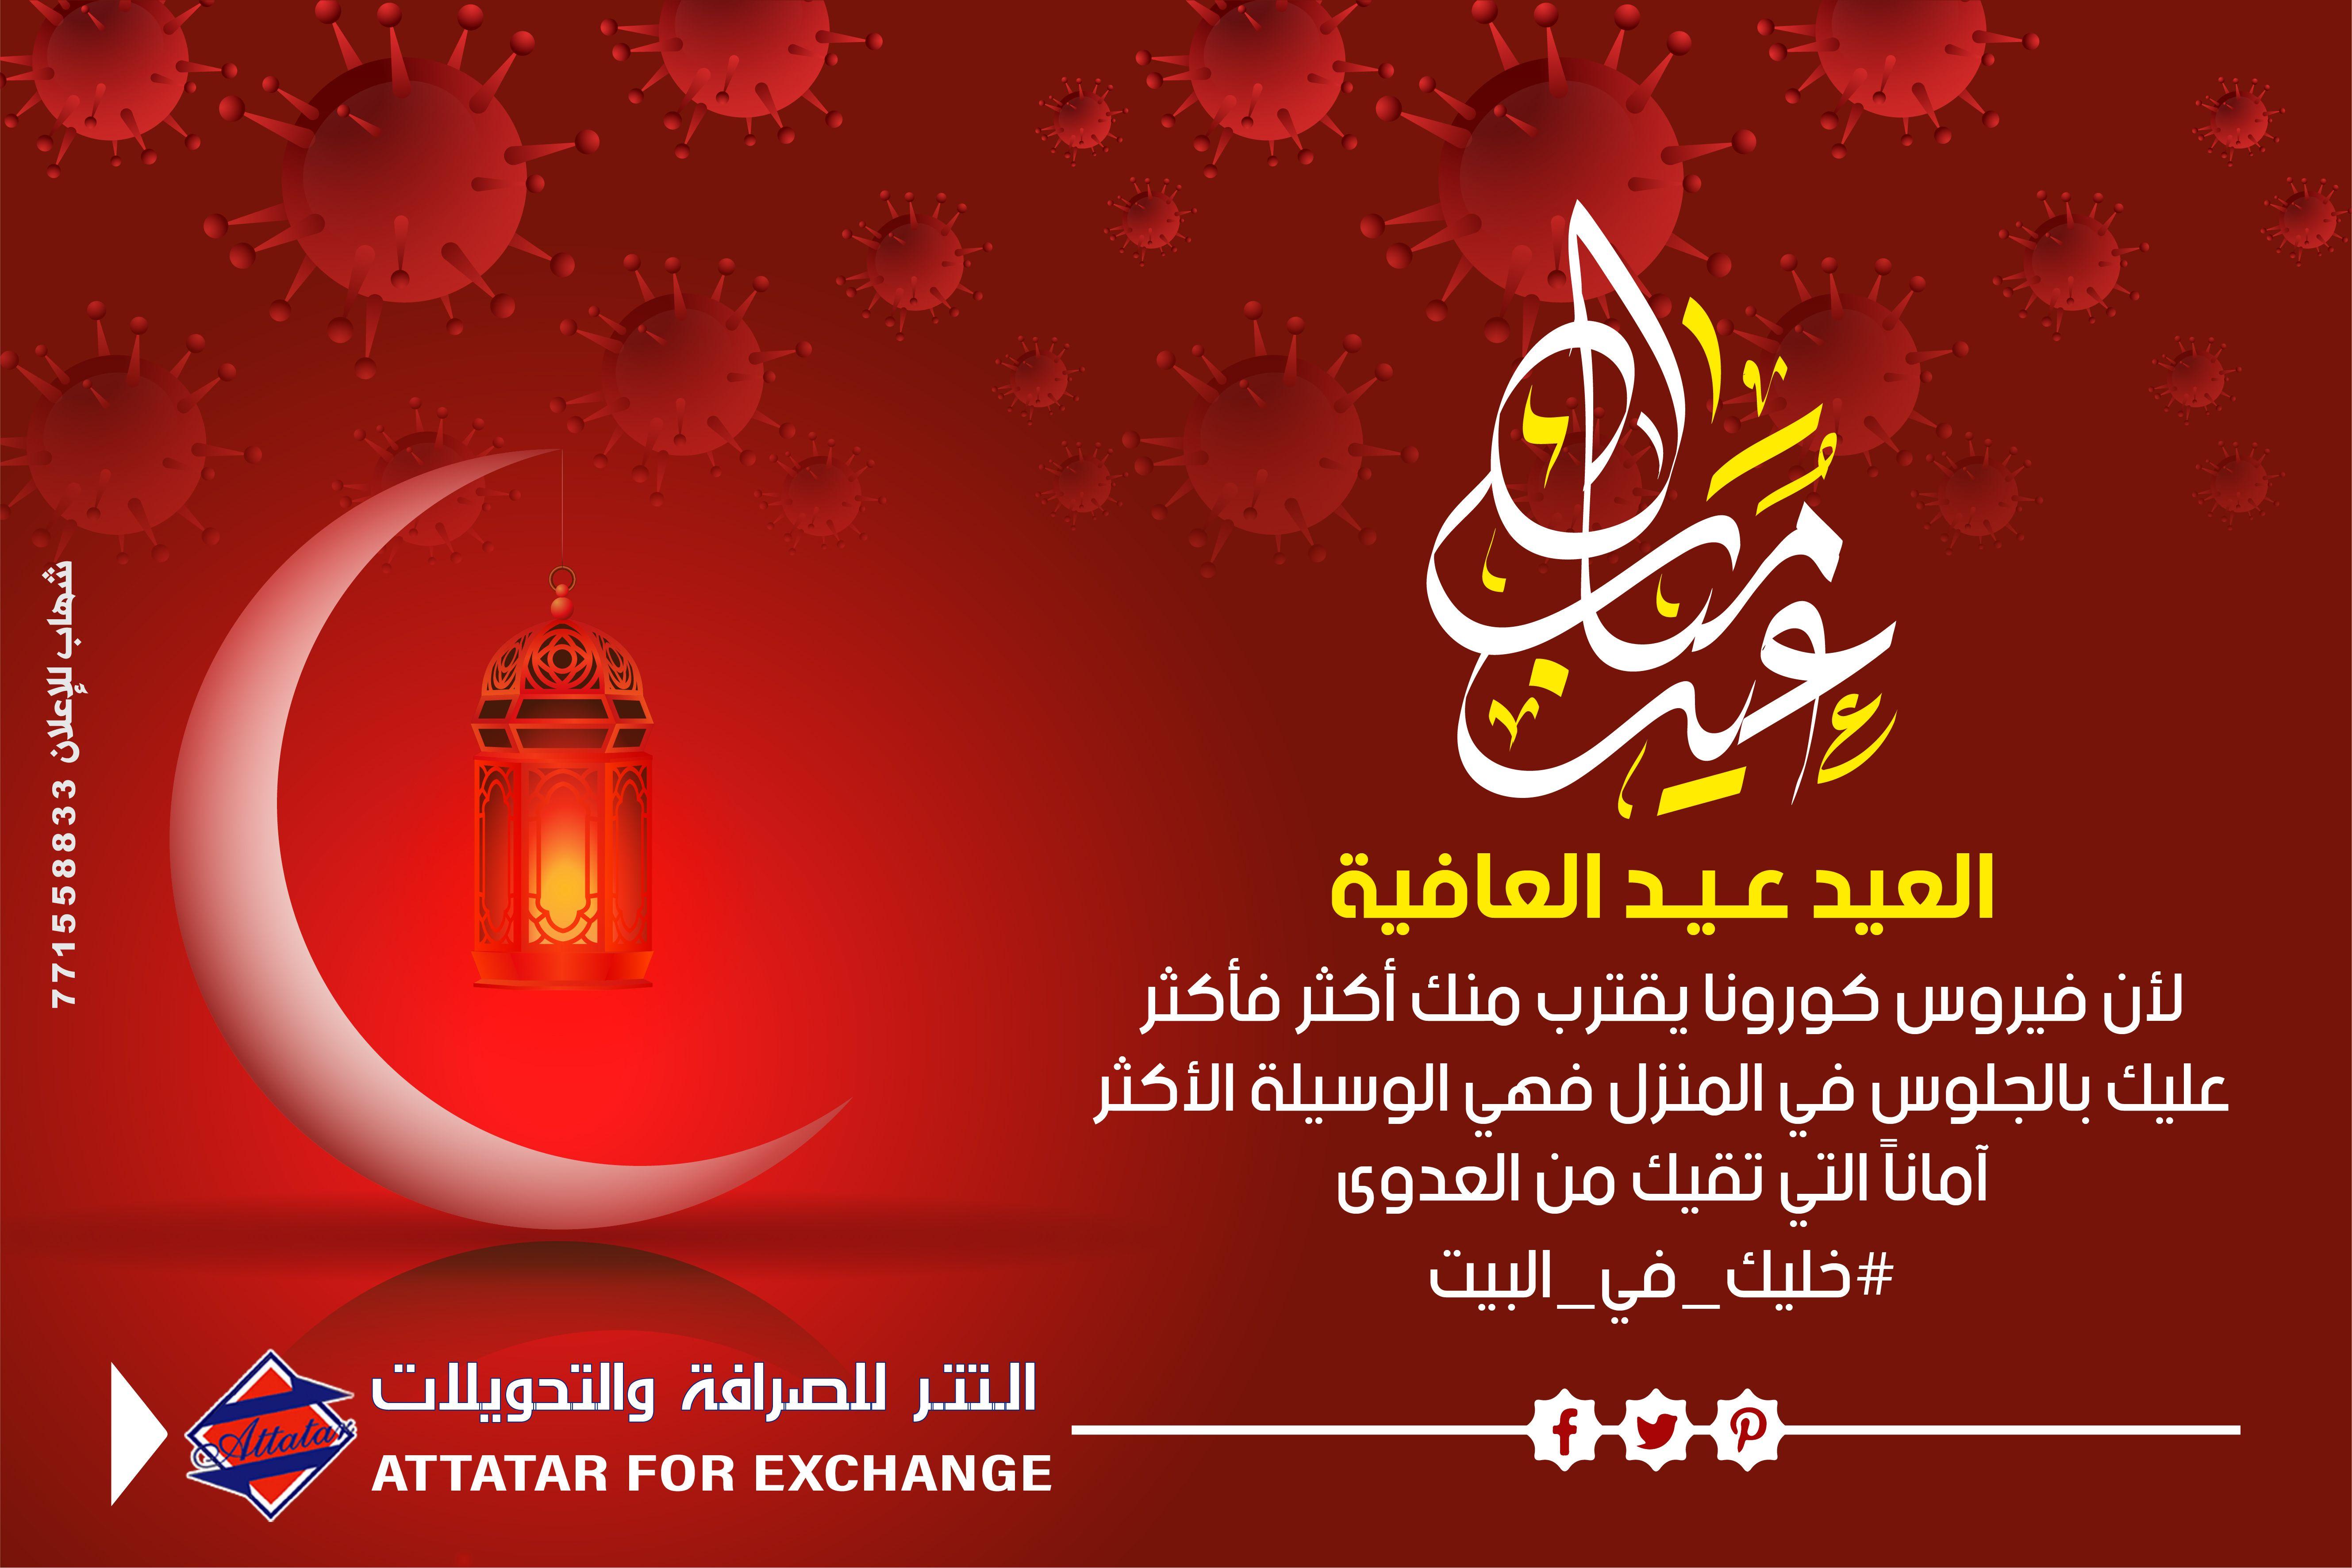 عيد مبارك Indesign Adobe Indesign Photoshop